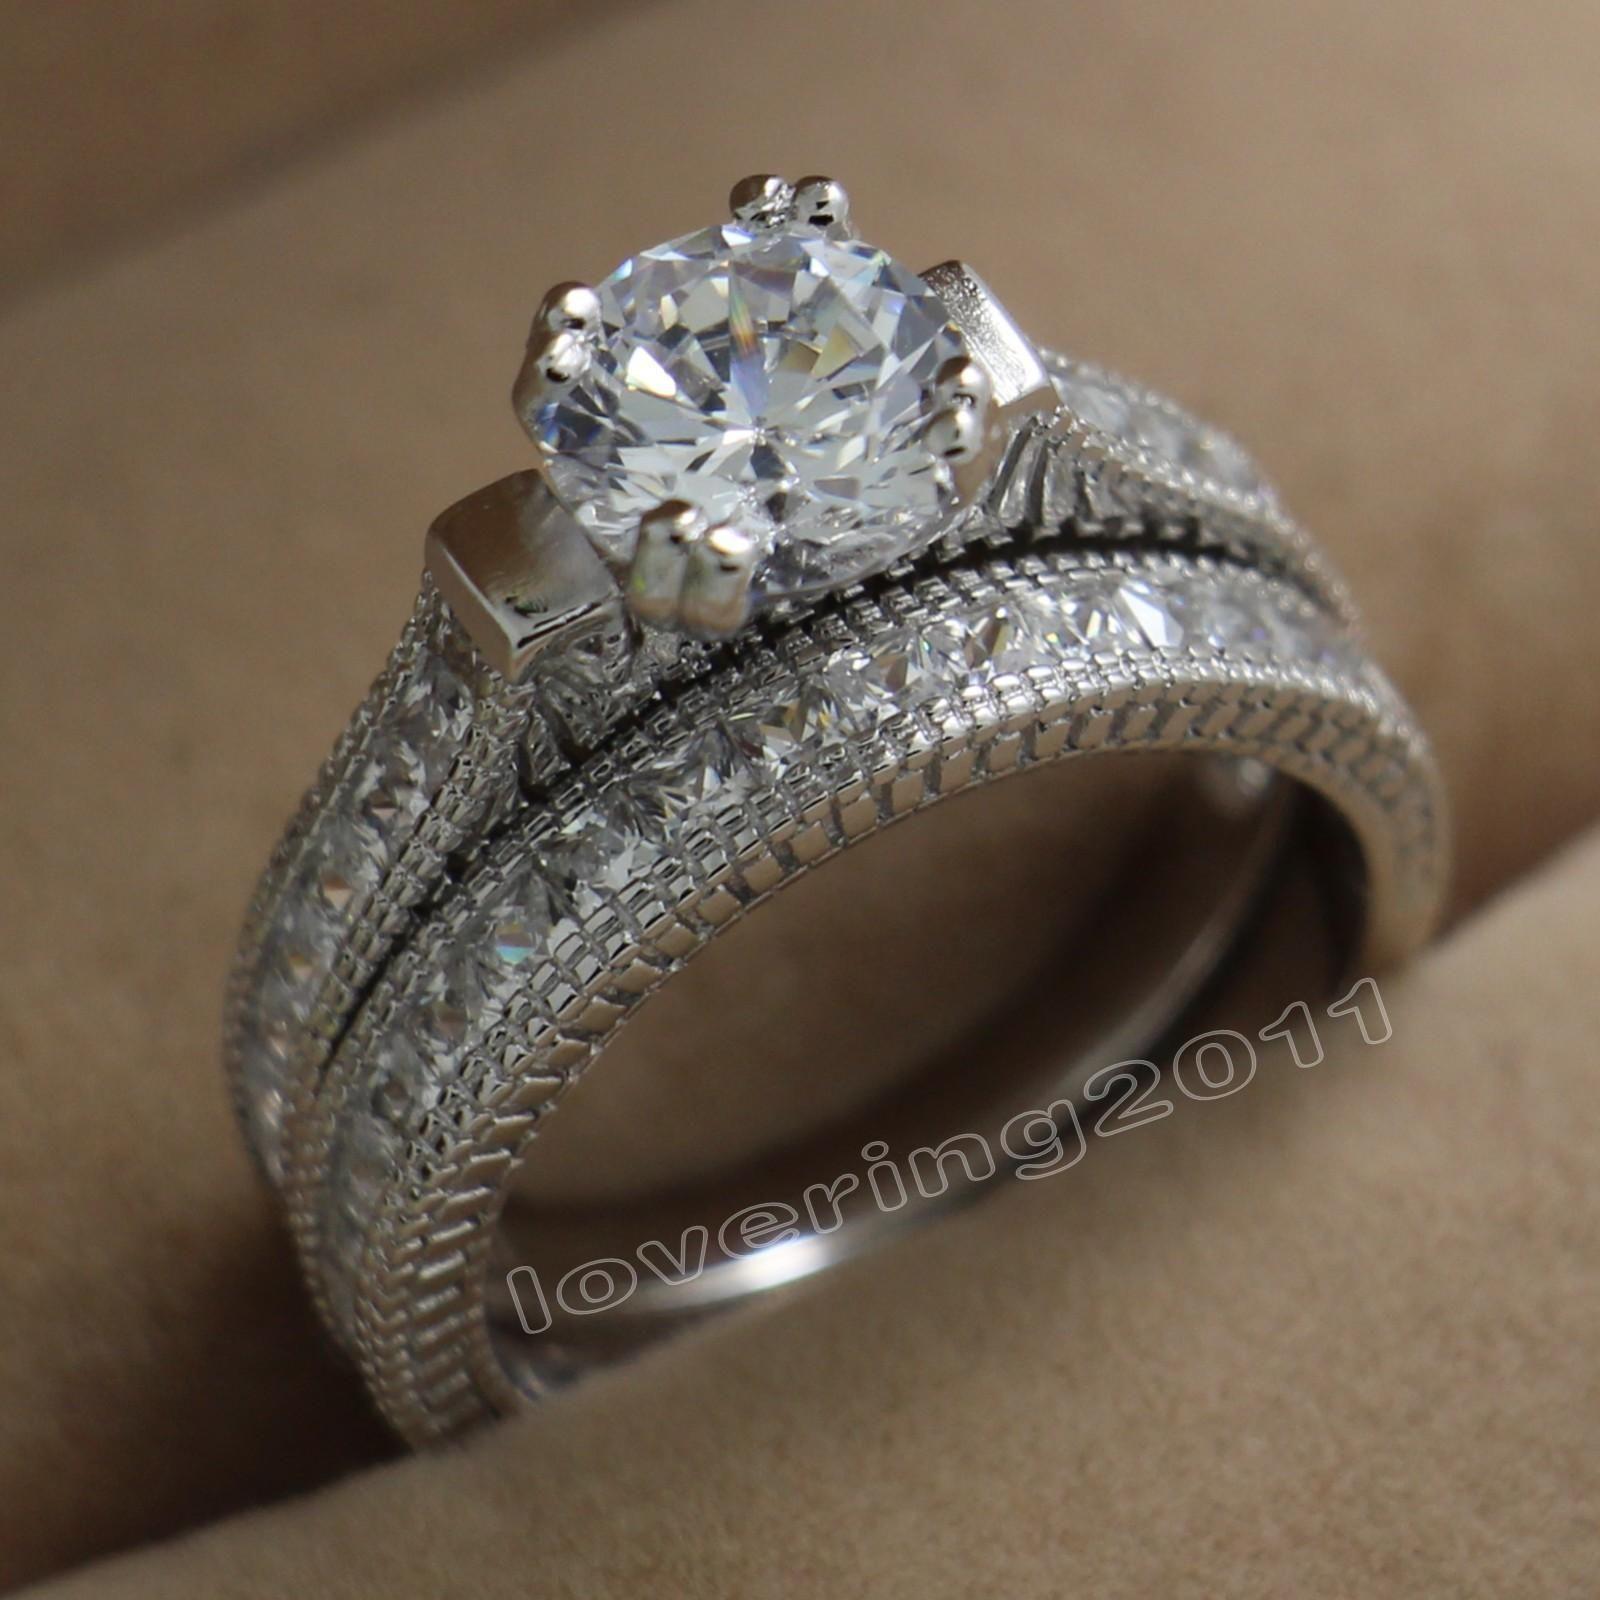 Key4fashion Free Size 5-10 Fashion jewelry round Cut Topaz 14KT White Gold Filled GF Simulated Diamond CZ Women Wedding Bridal Ring Set gift